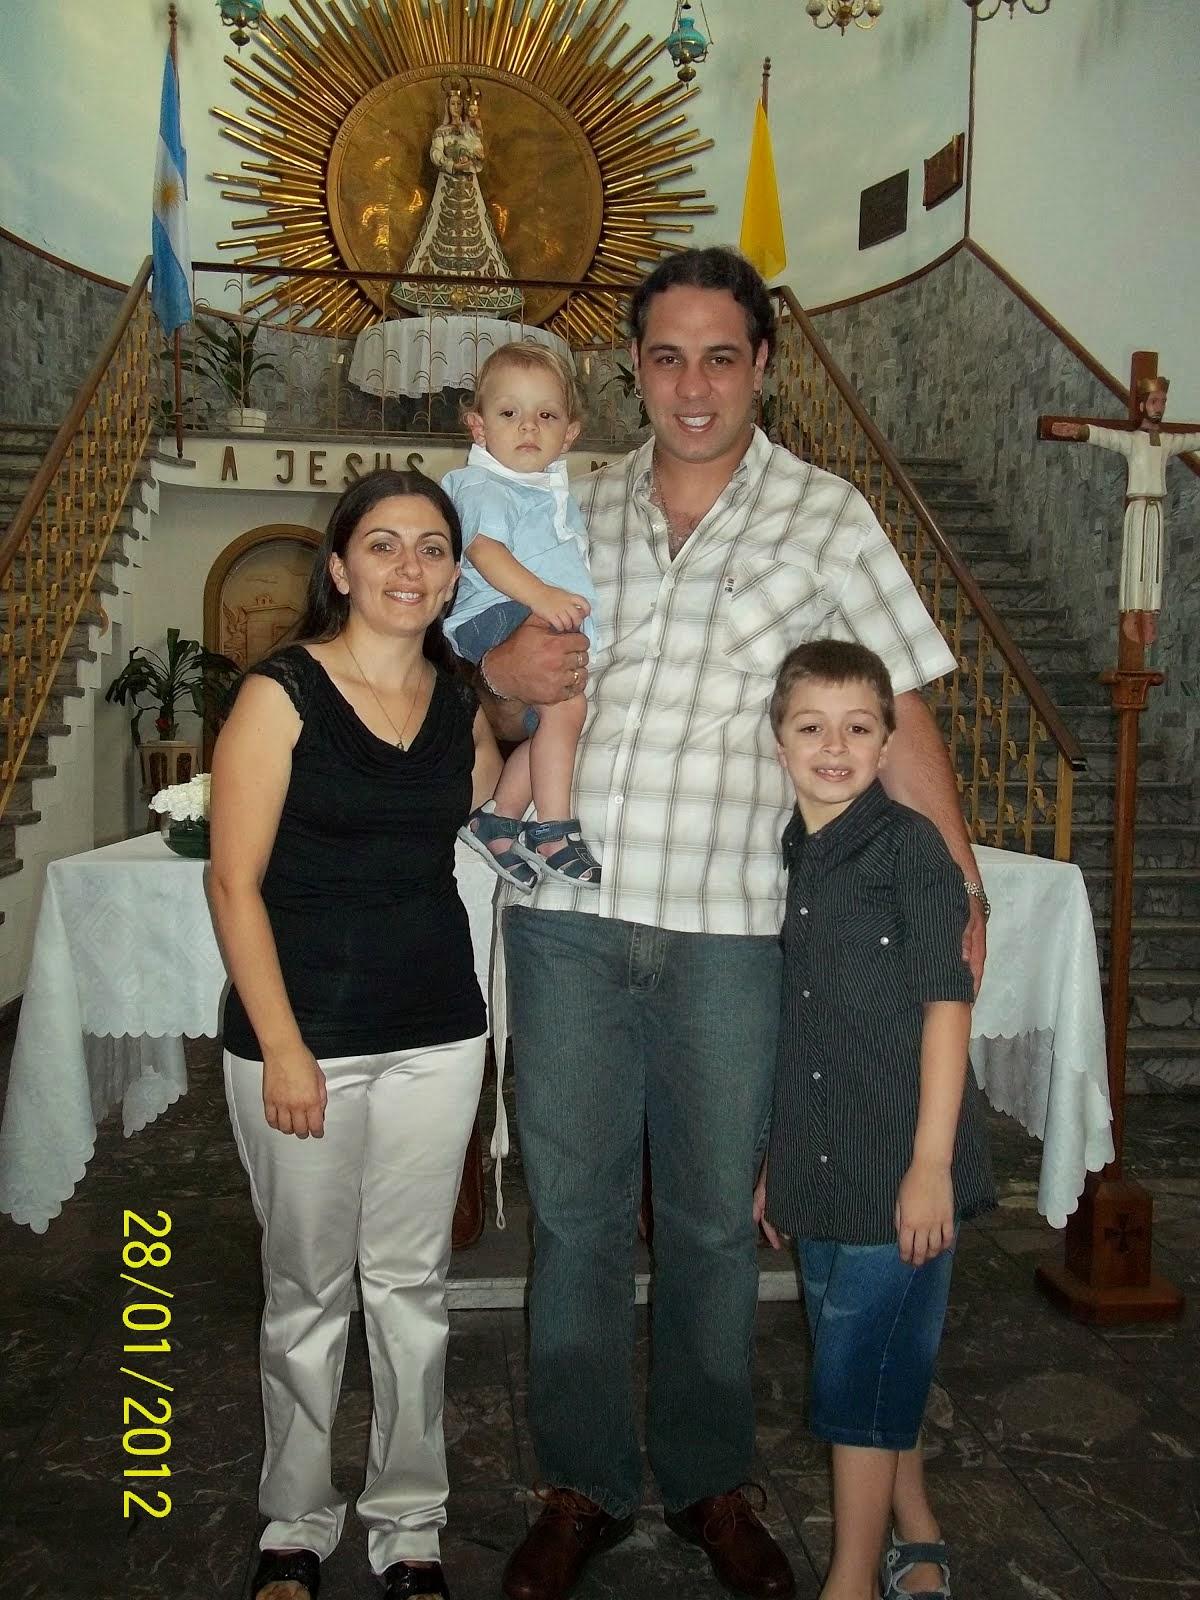 Su bautismo